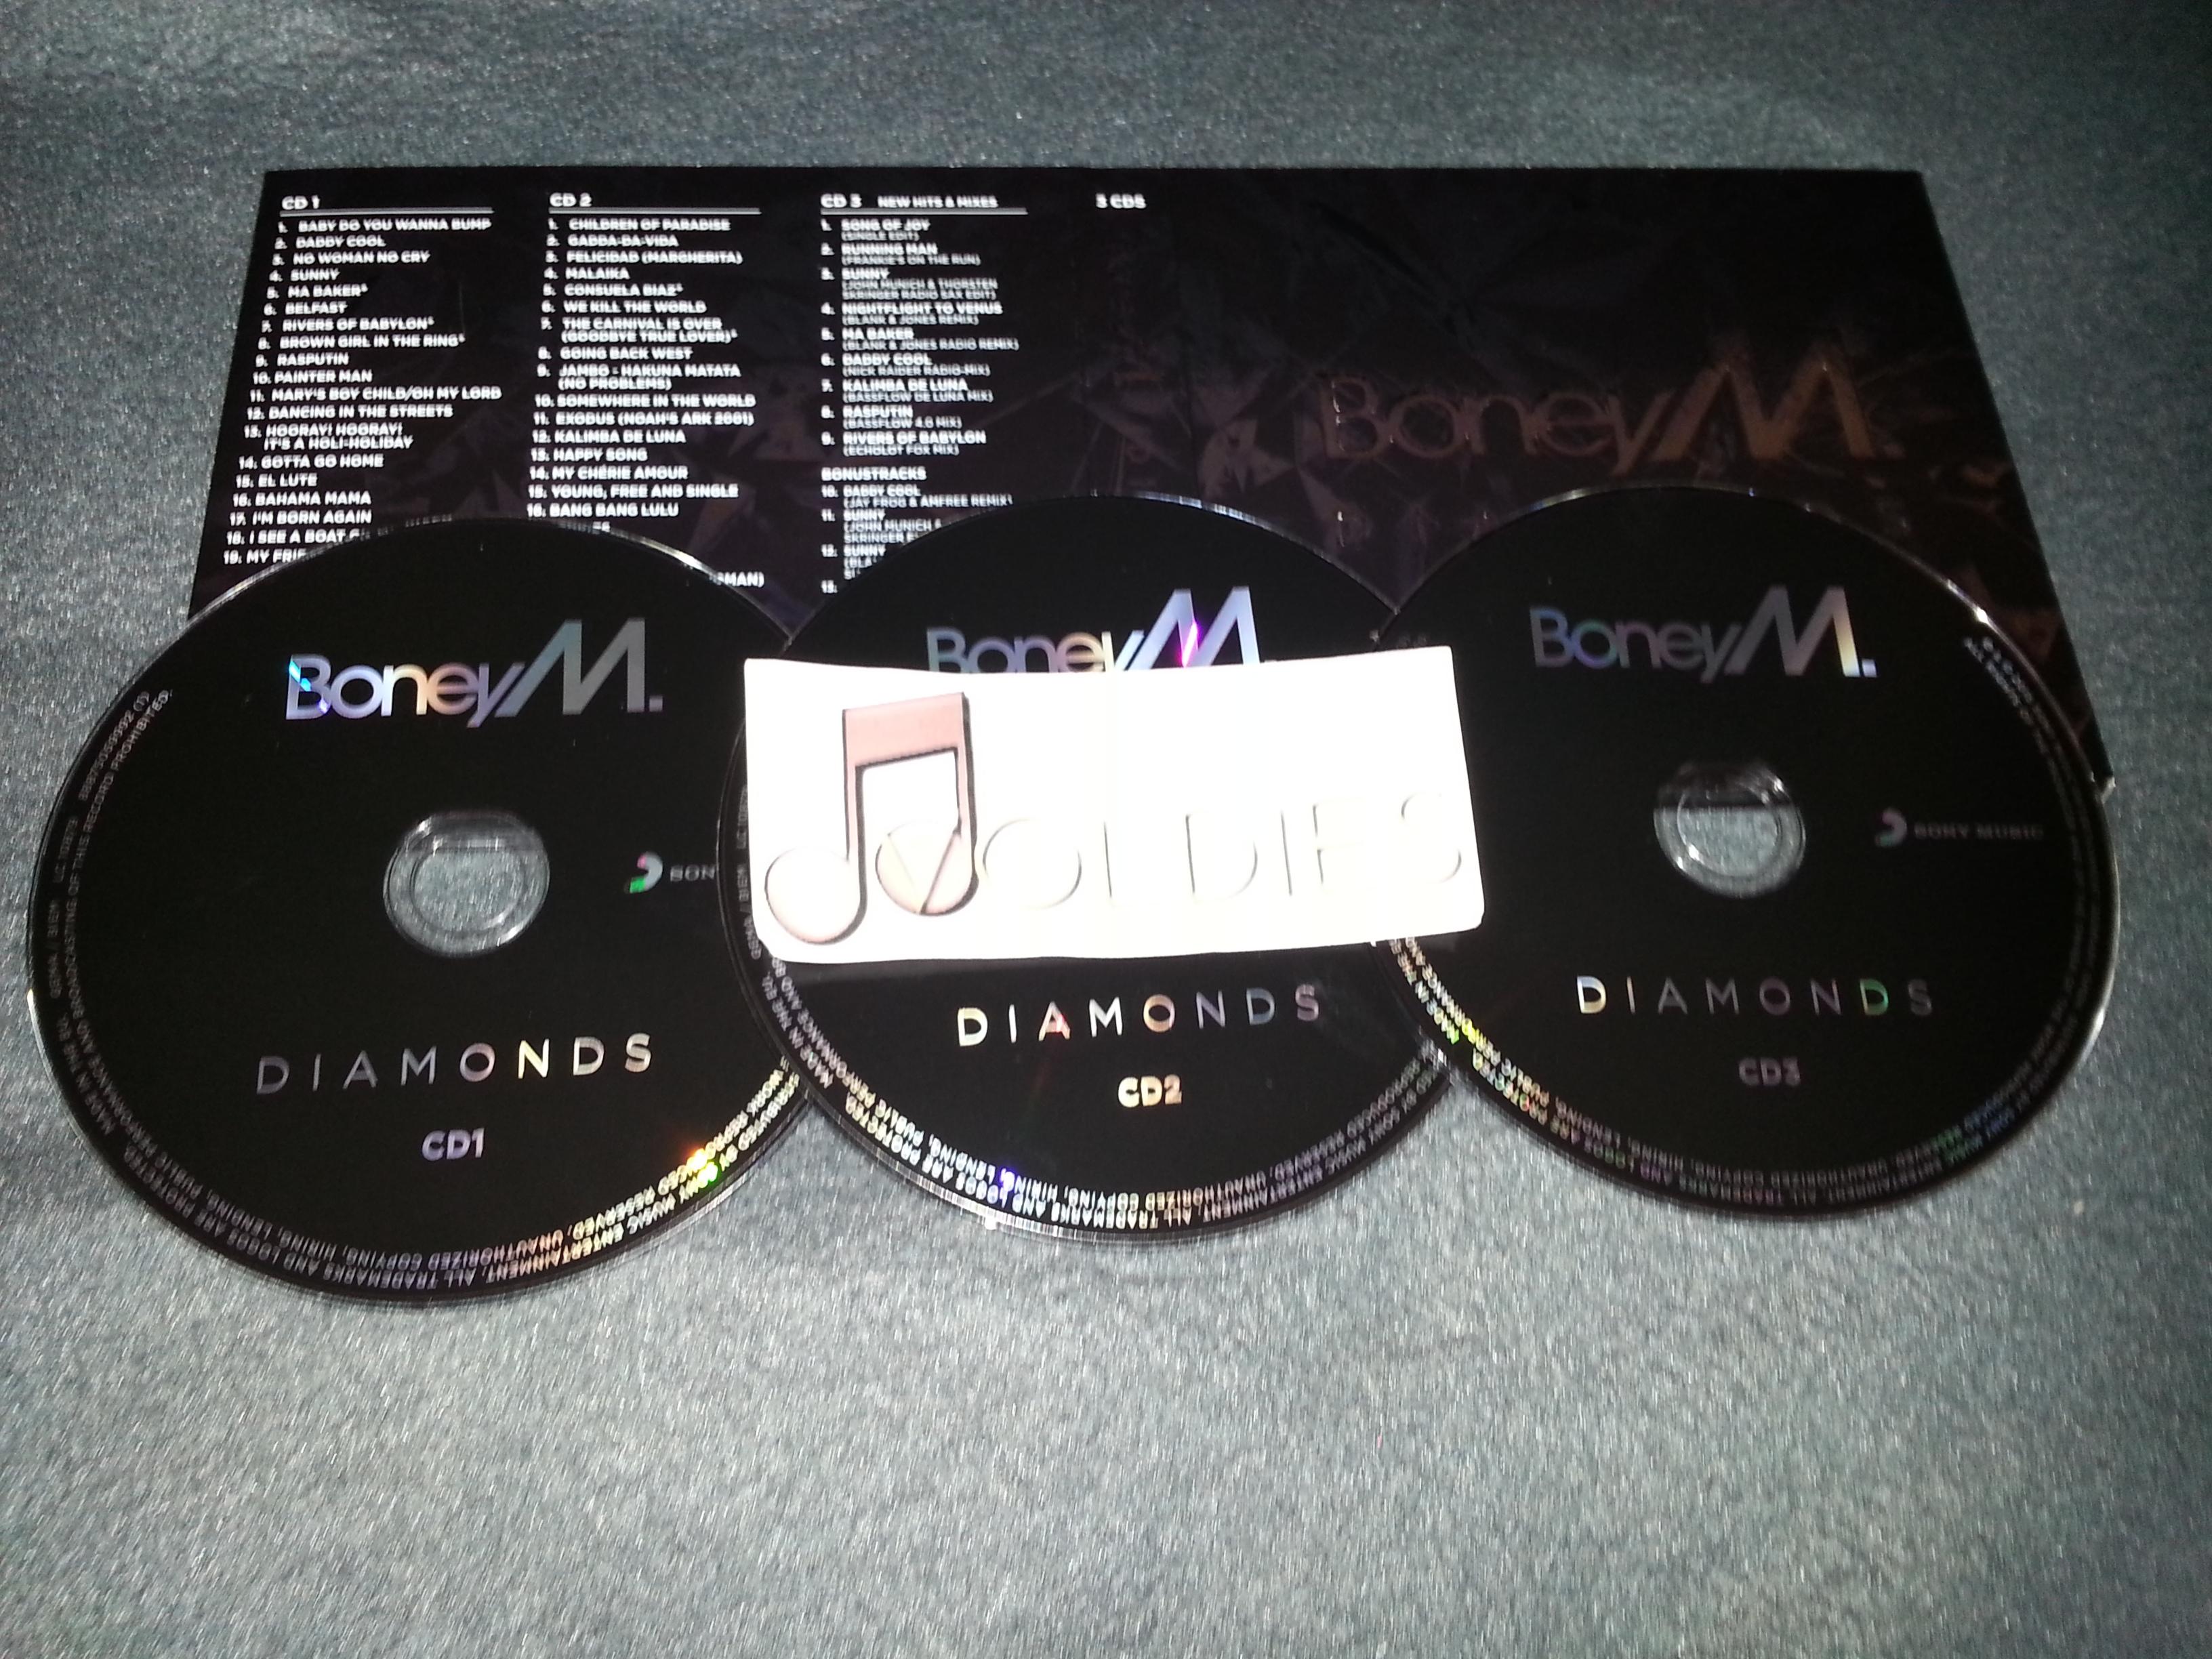 Boney M  - Diamonds (40th Anniversary Edition) (3-CD) - 2015